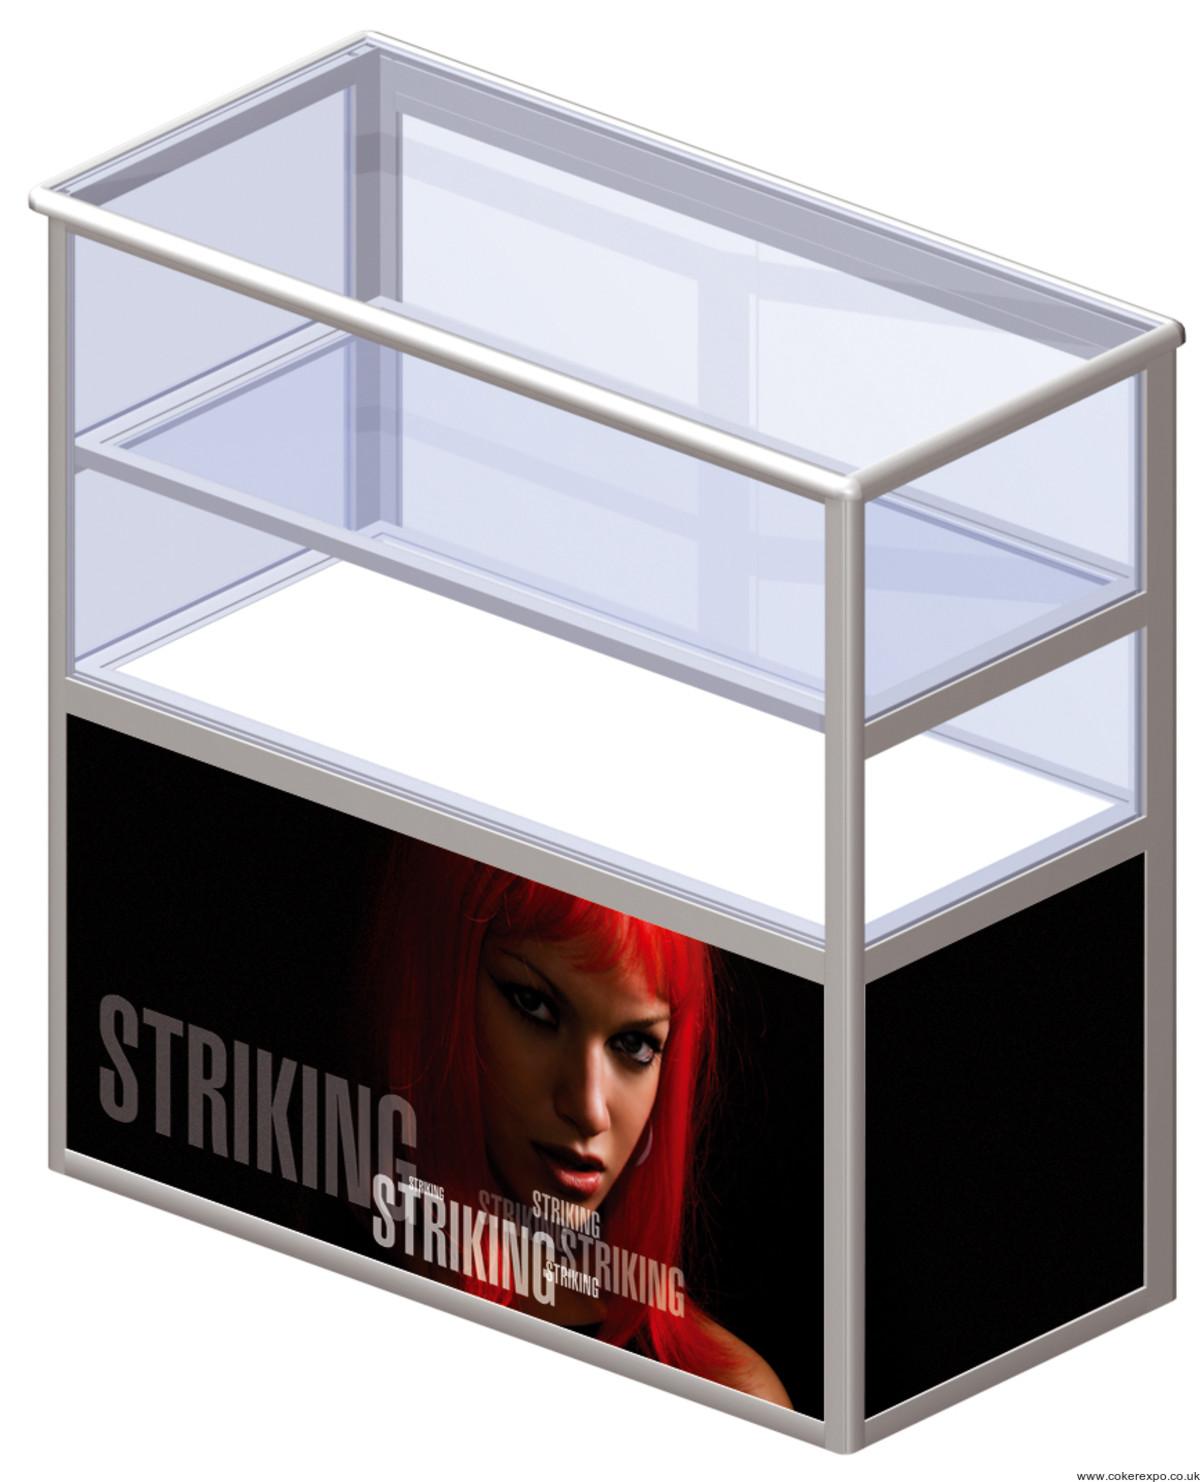 Portable Exhibition Shelves : Portable shelving unit vs with plywood shelves counter